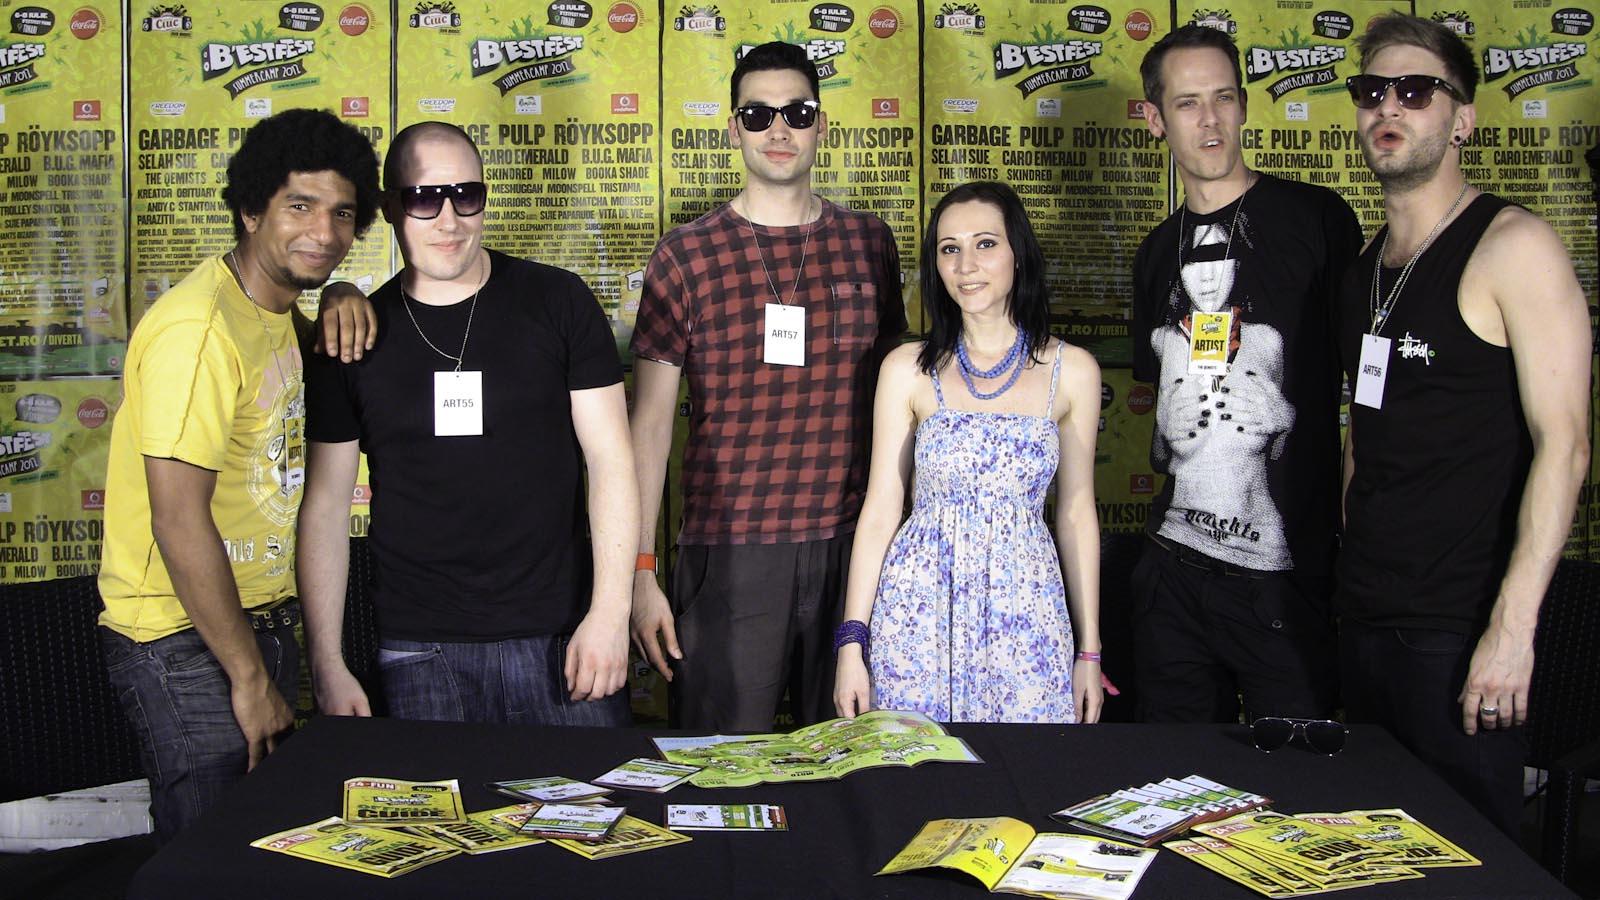 The Qemists - interviu InfoMusic.ro la B'Estfest 2012